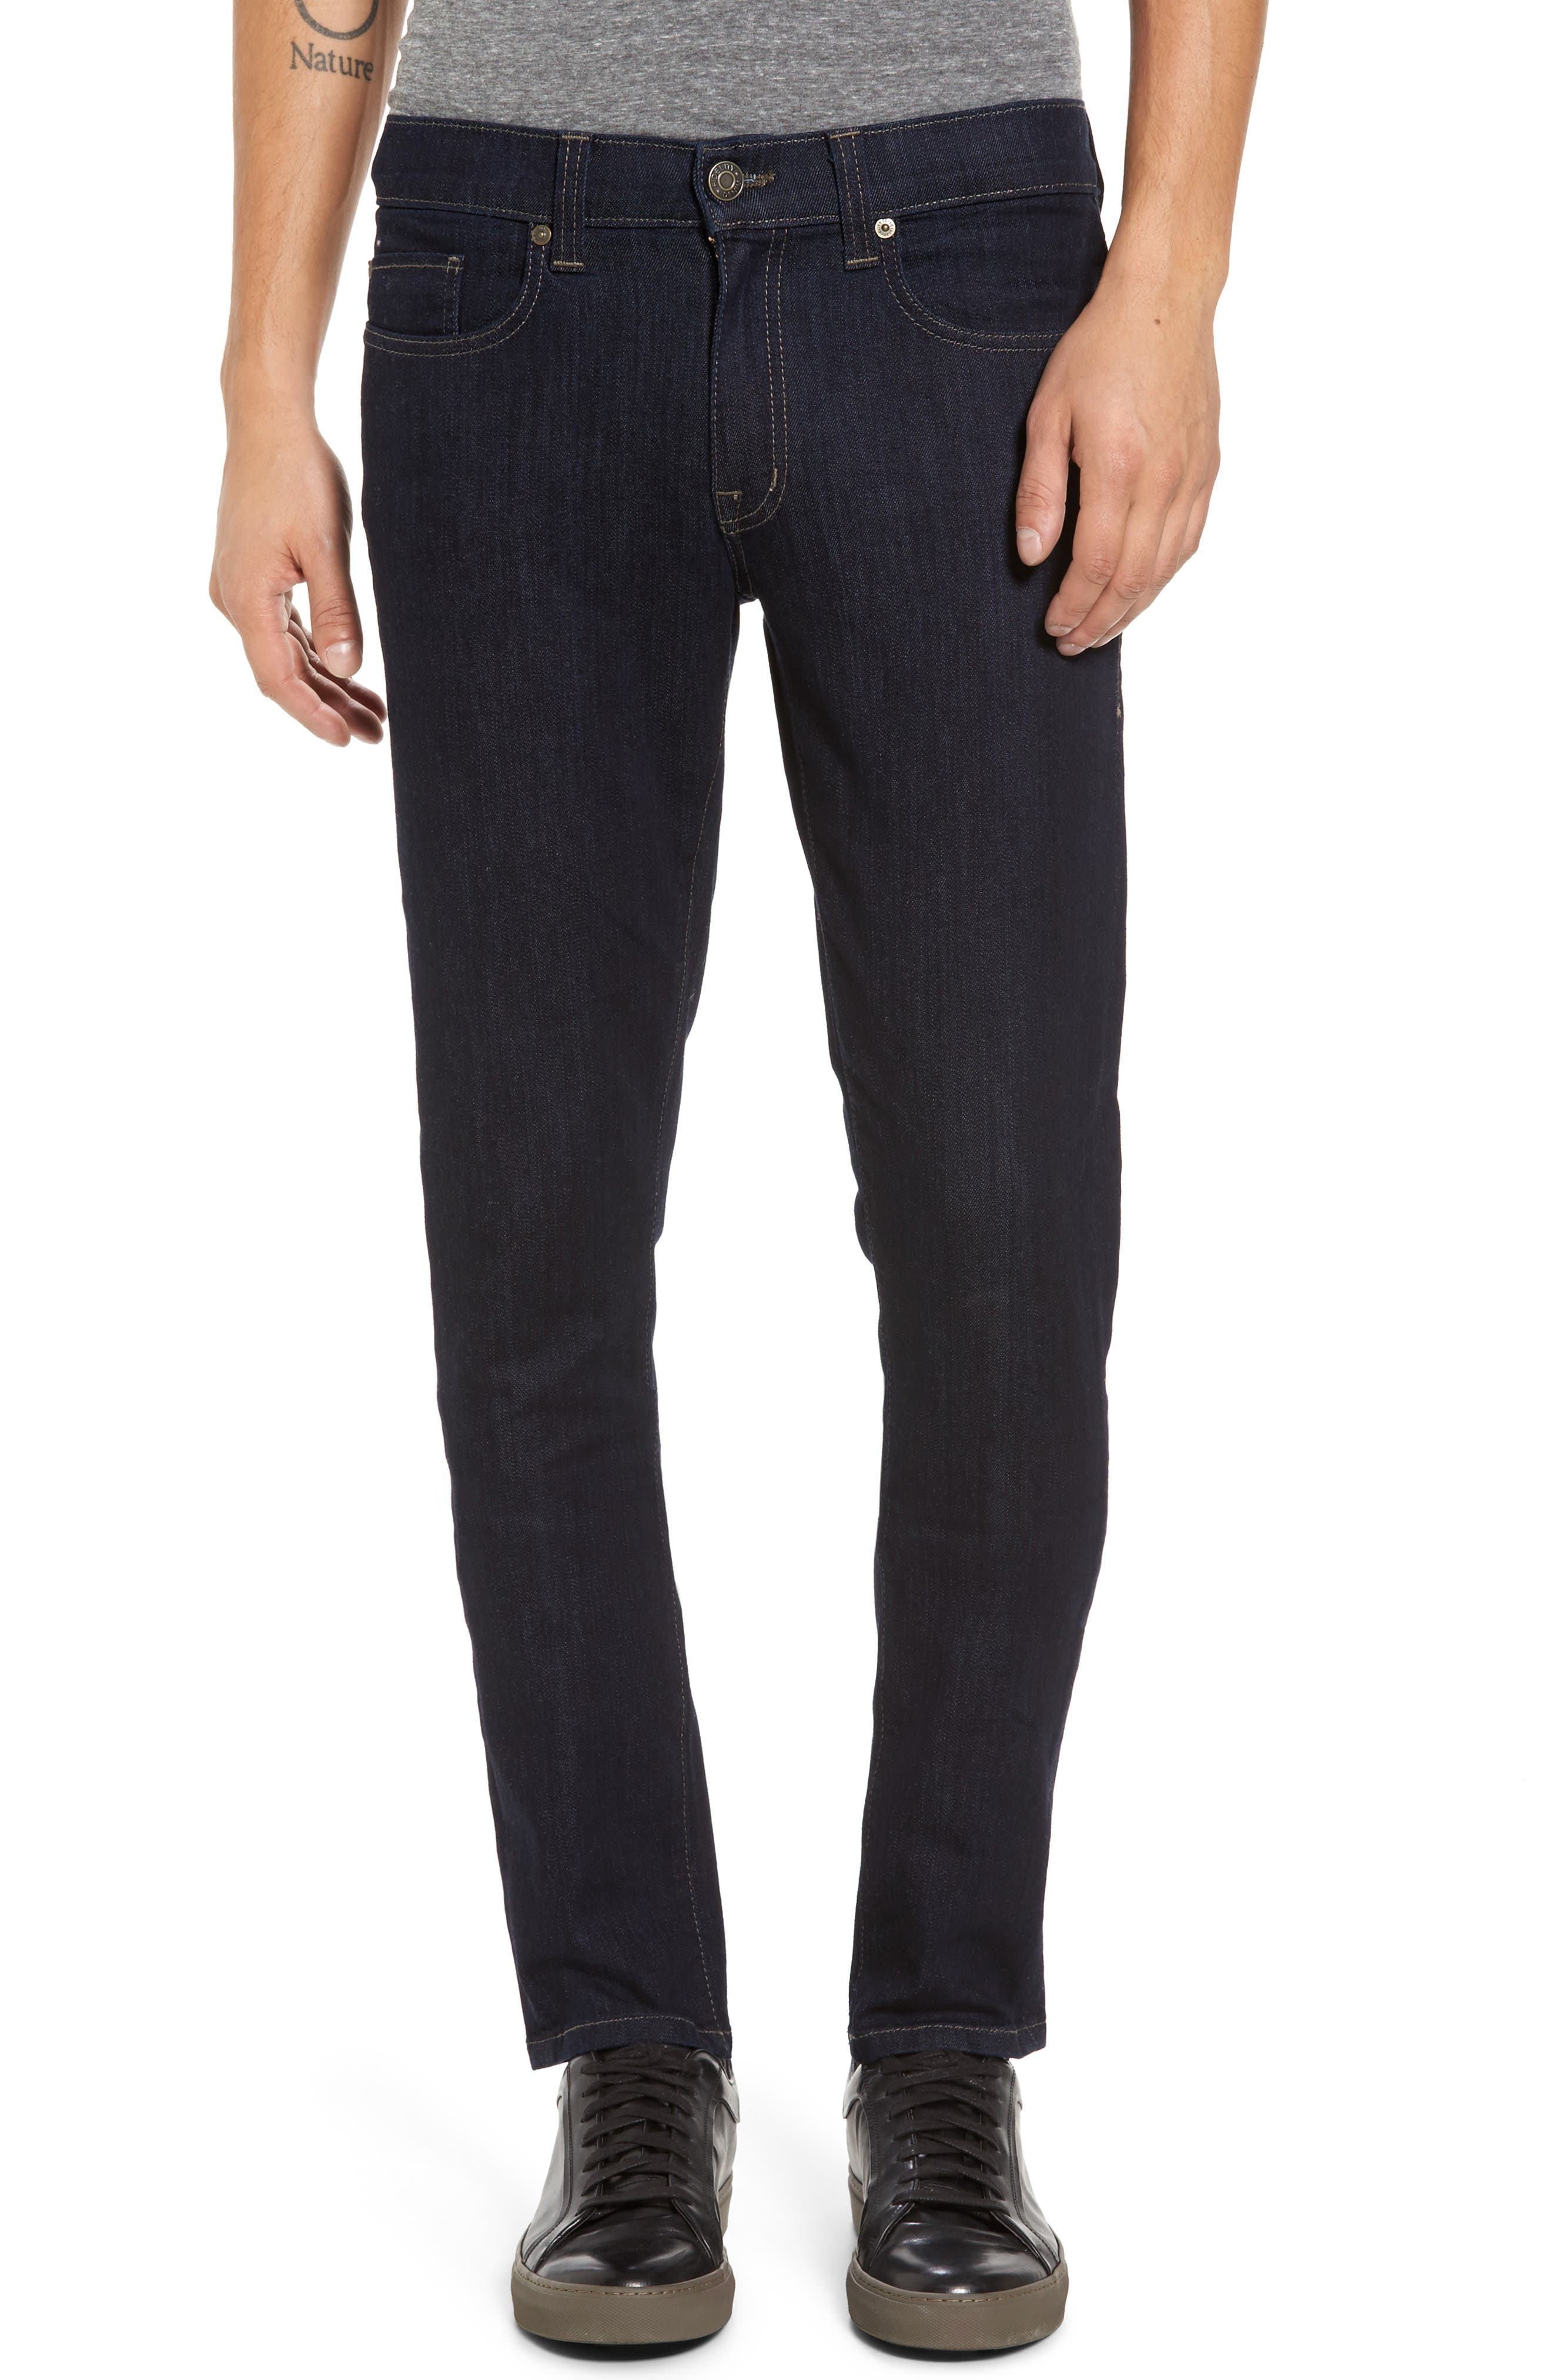 Alternate Image 1 Selected - Fidelity Denim Vantage Skinny Fit Jeans (Galaxy Rinse)